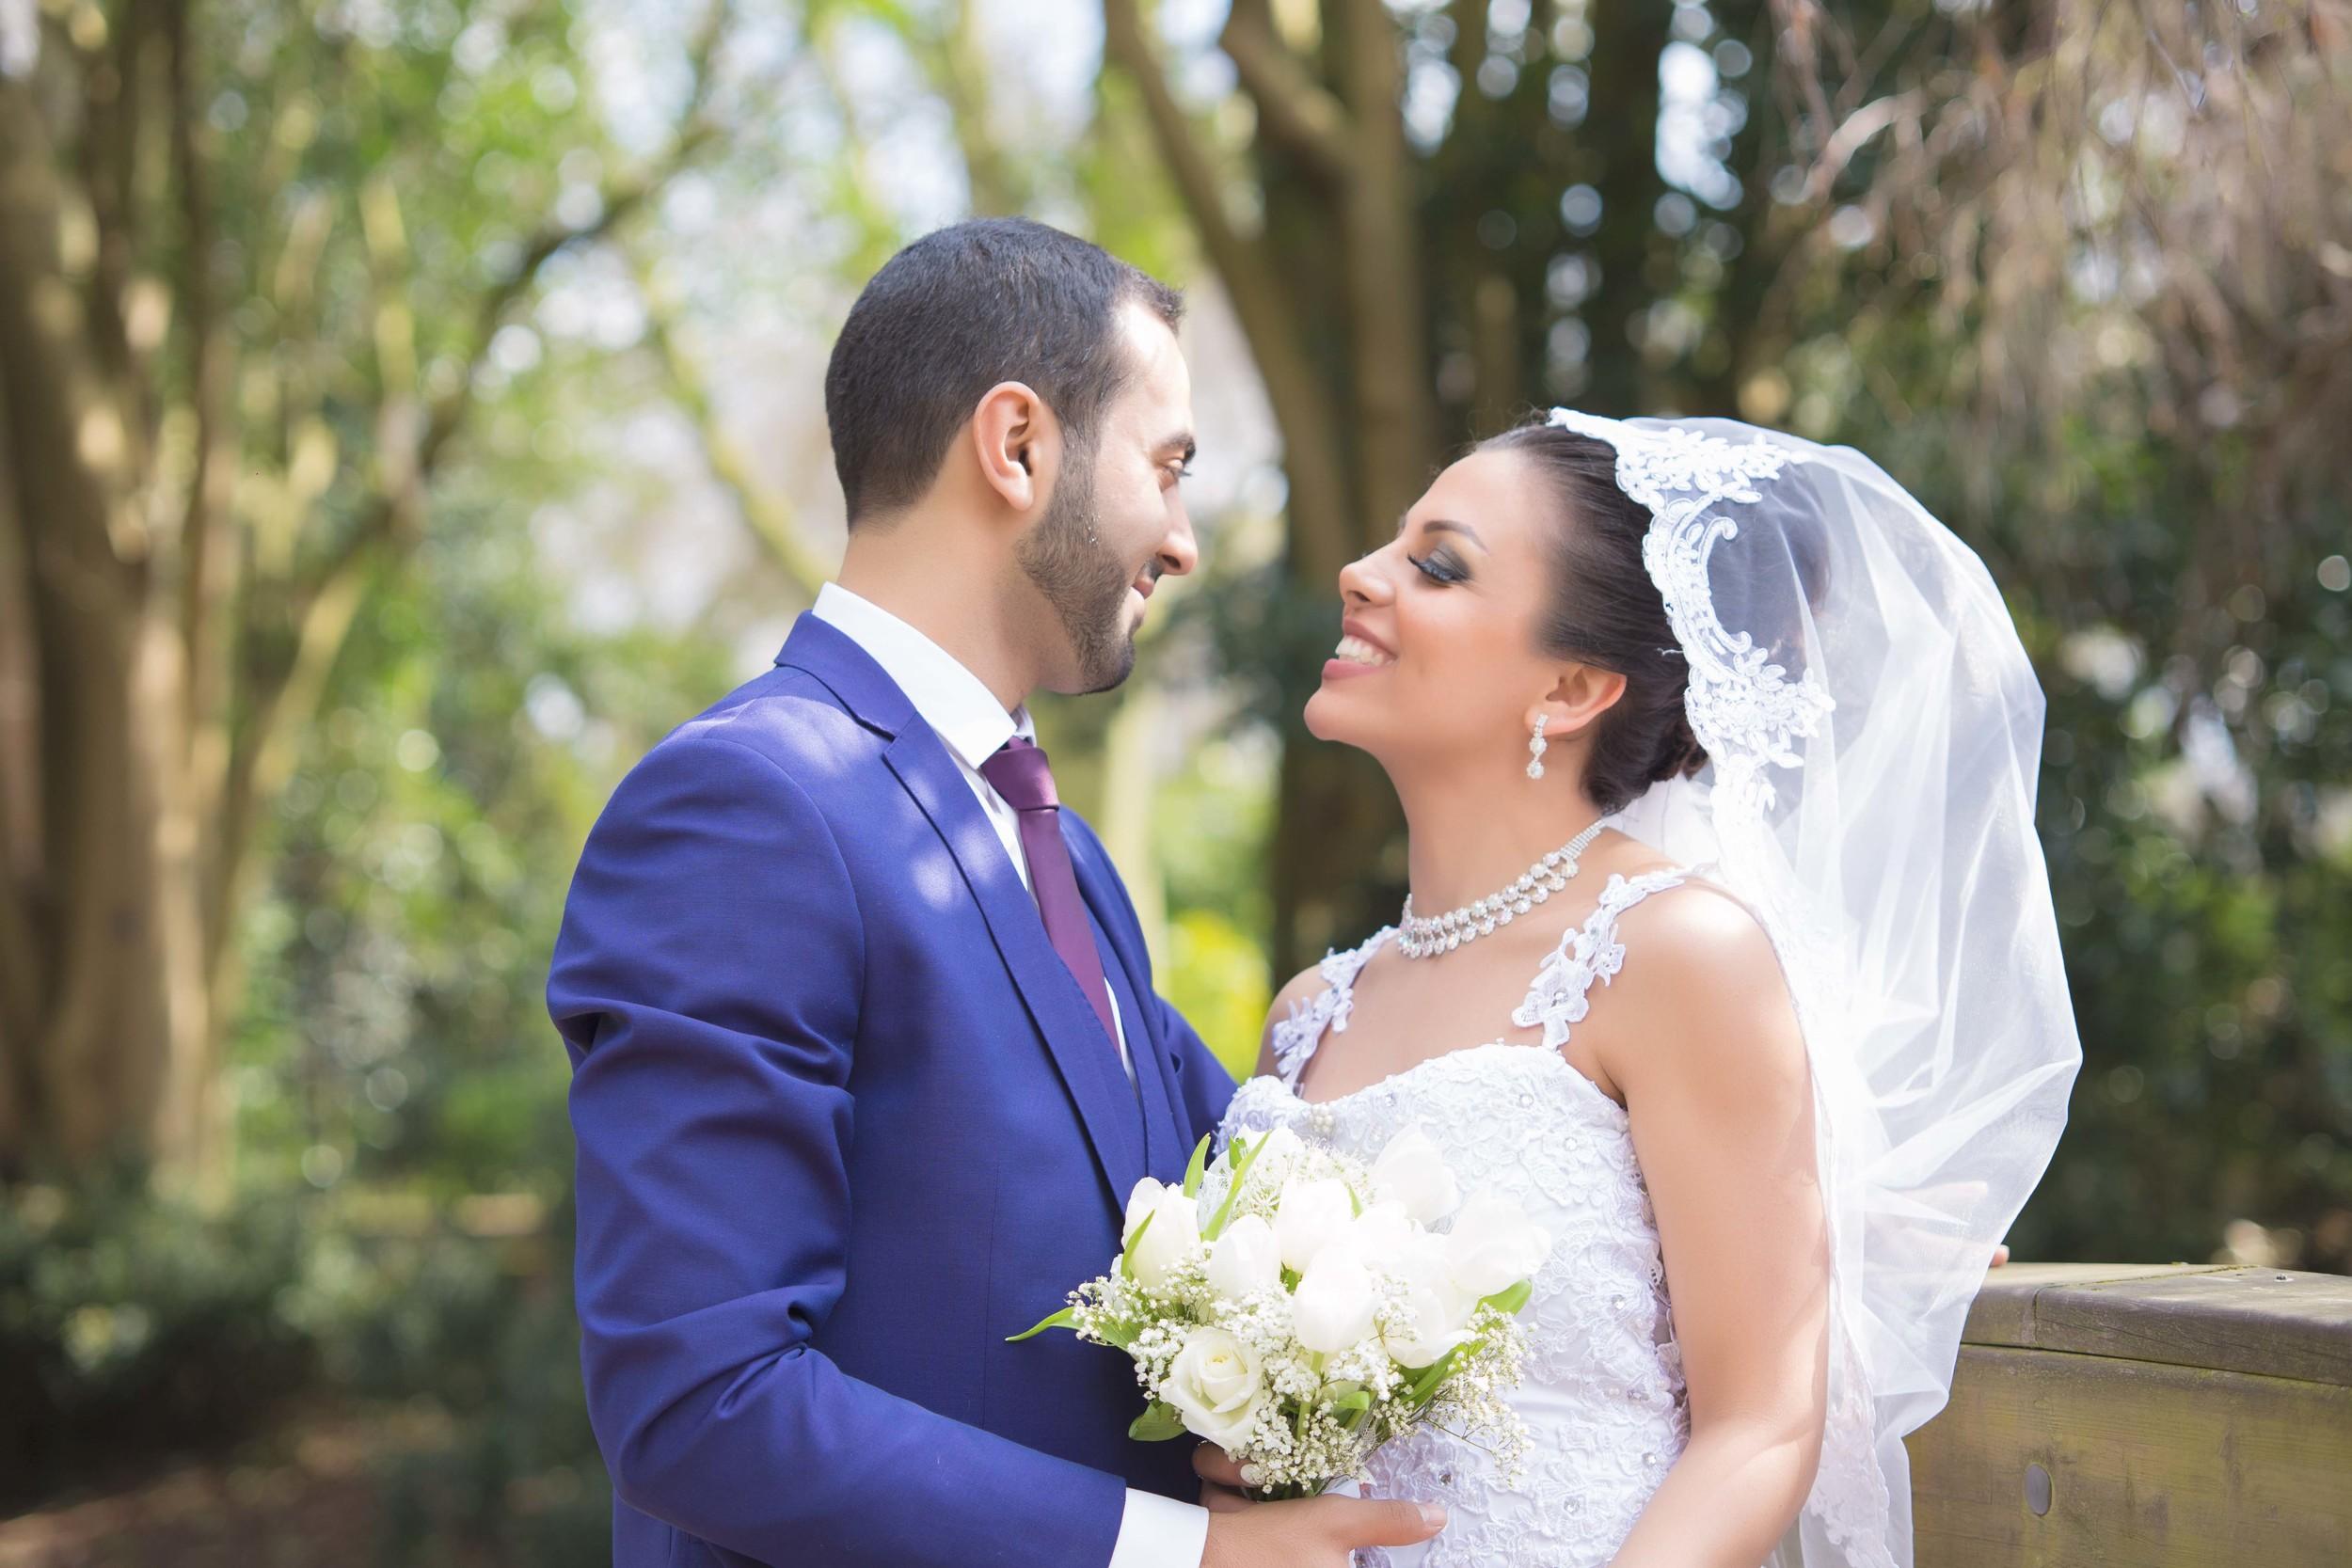 Nasha & Ali - London Wedding Photography